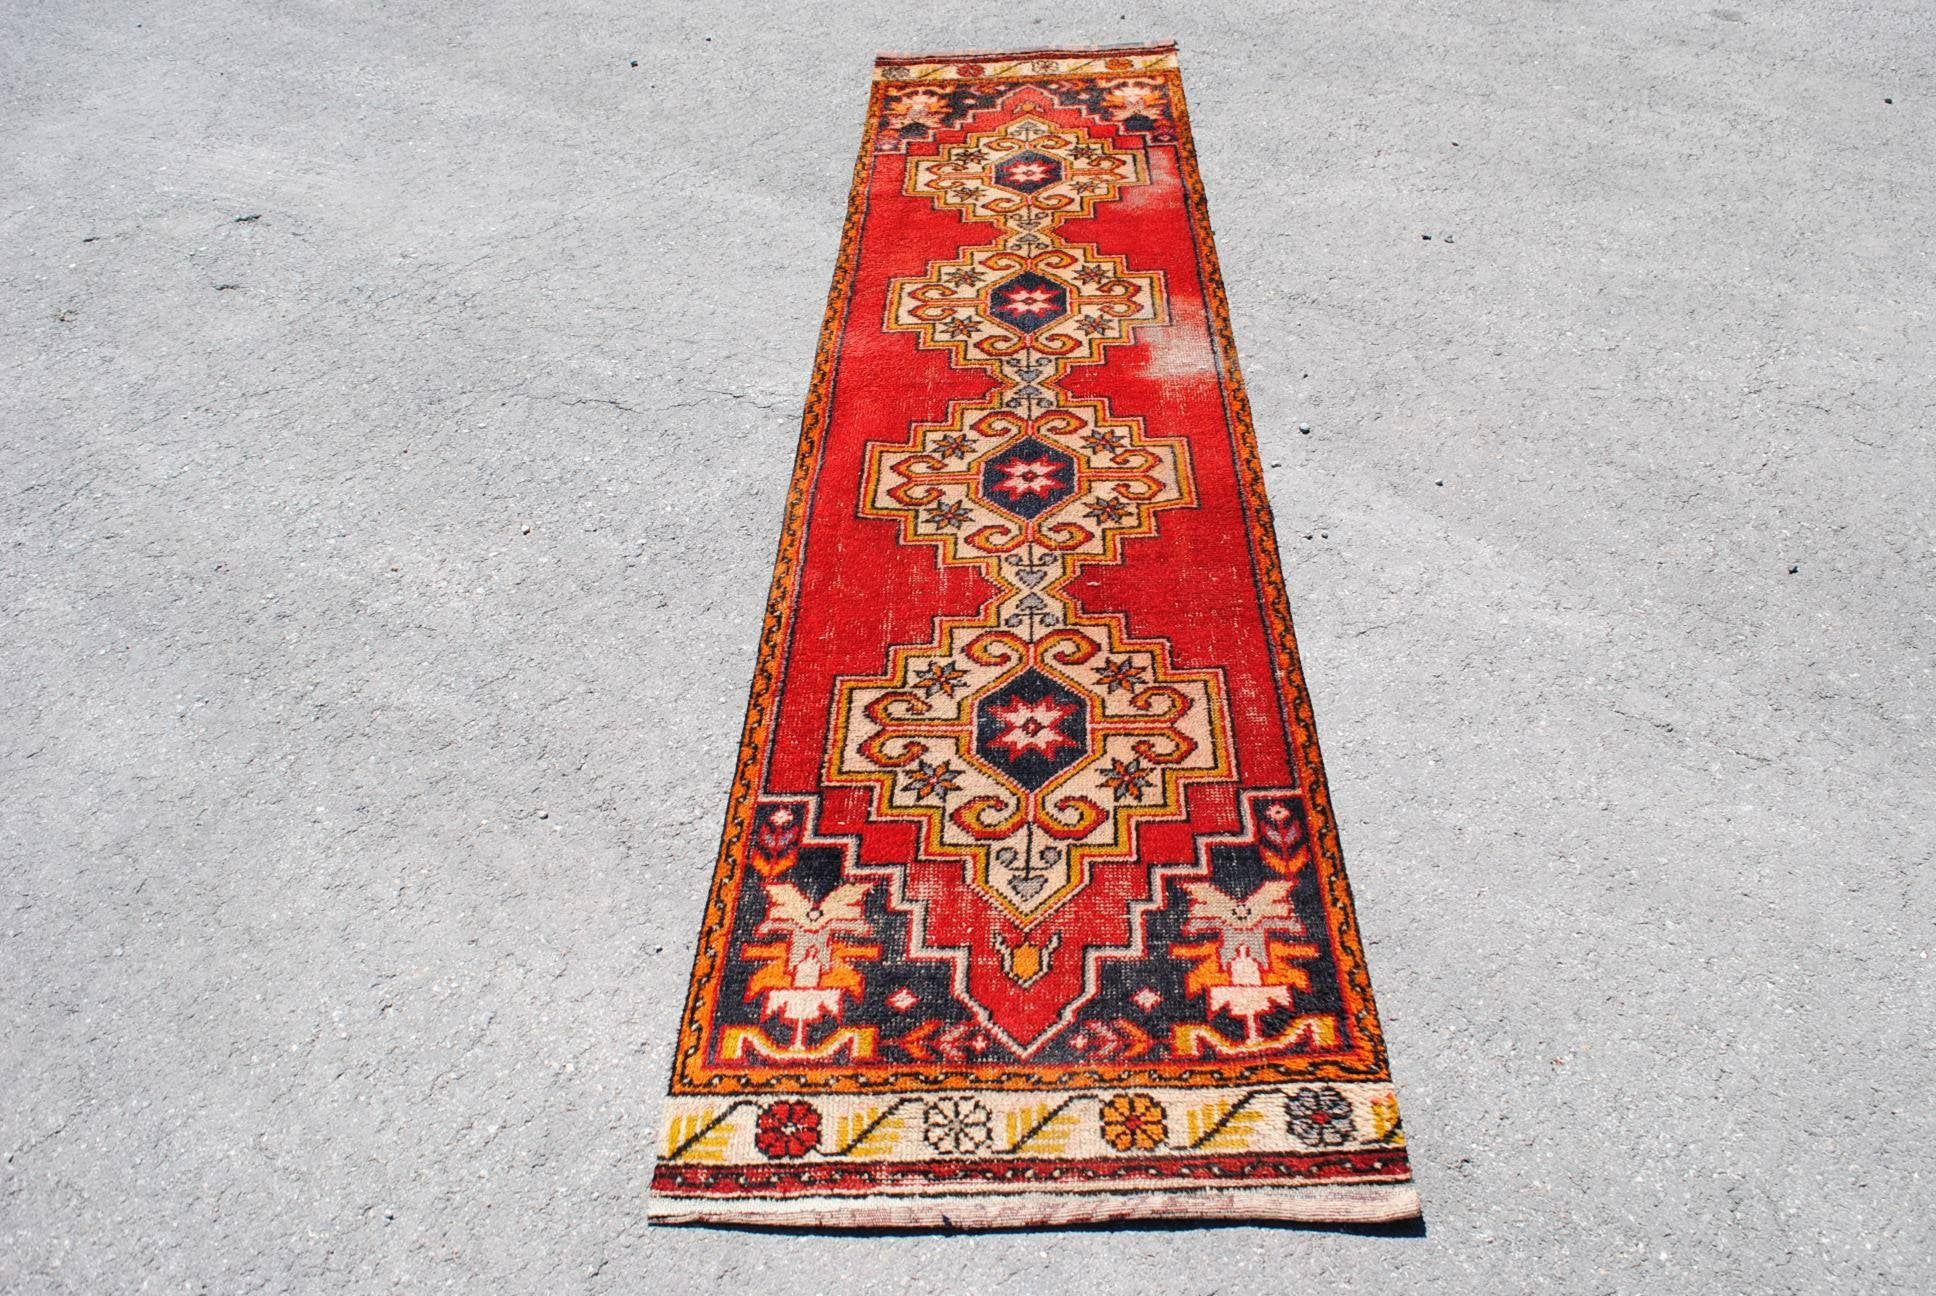 2 4x9 6 Ft Handknotted Rug Free Shipping Natural Rug Etsy Kilim Rug Geometric Rugs Natural Rug